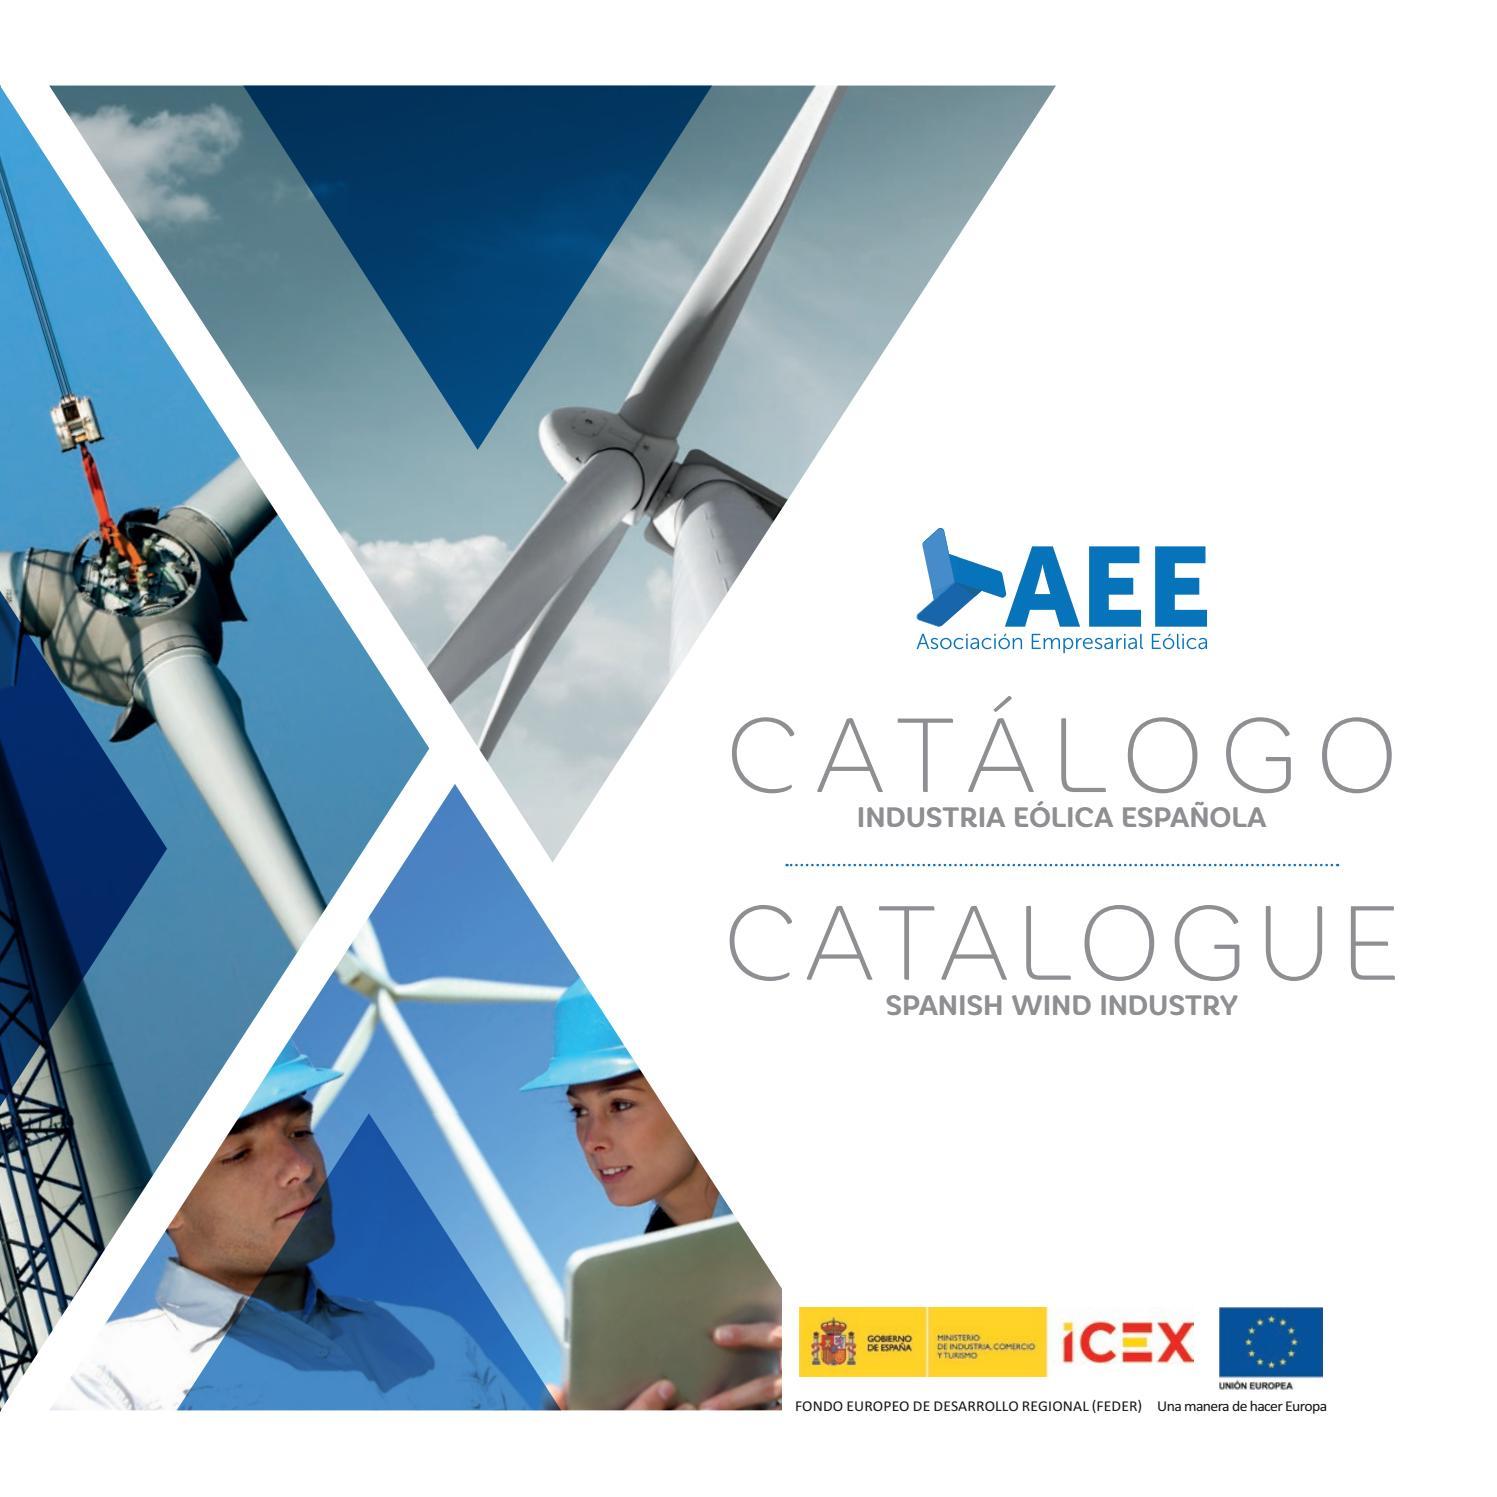 Catálogo de la Industria Eólica Española by AEEOLICA AEE - issuu